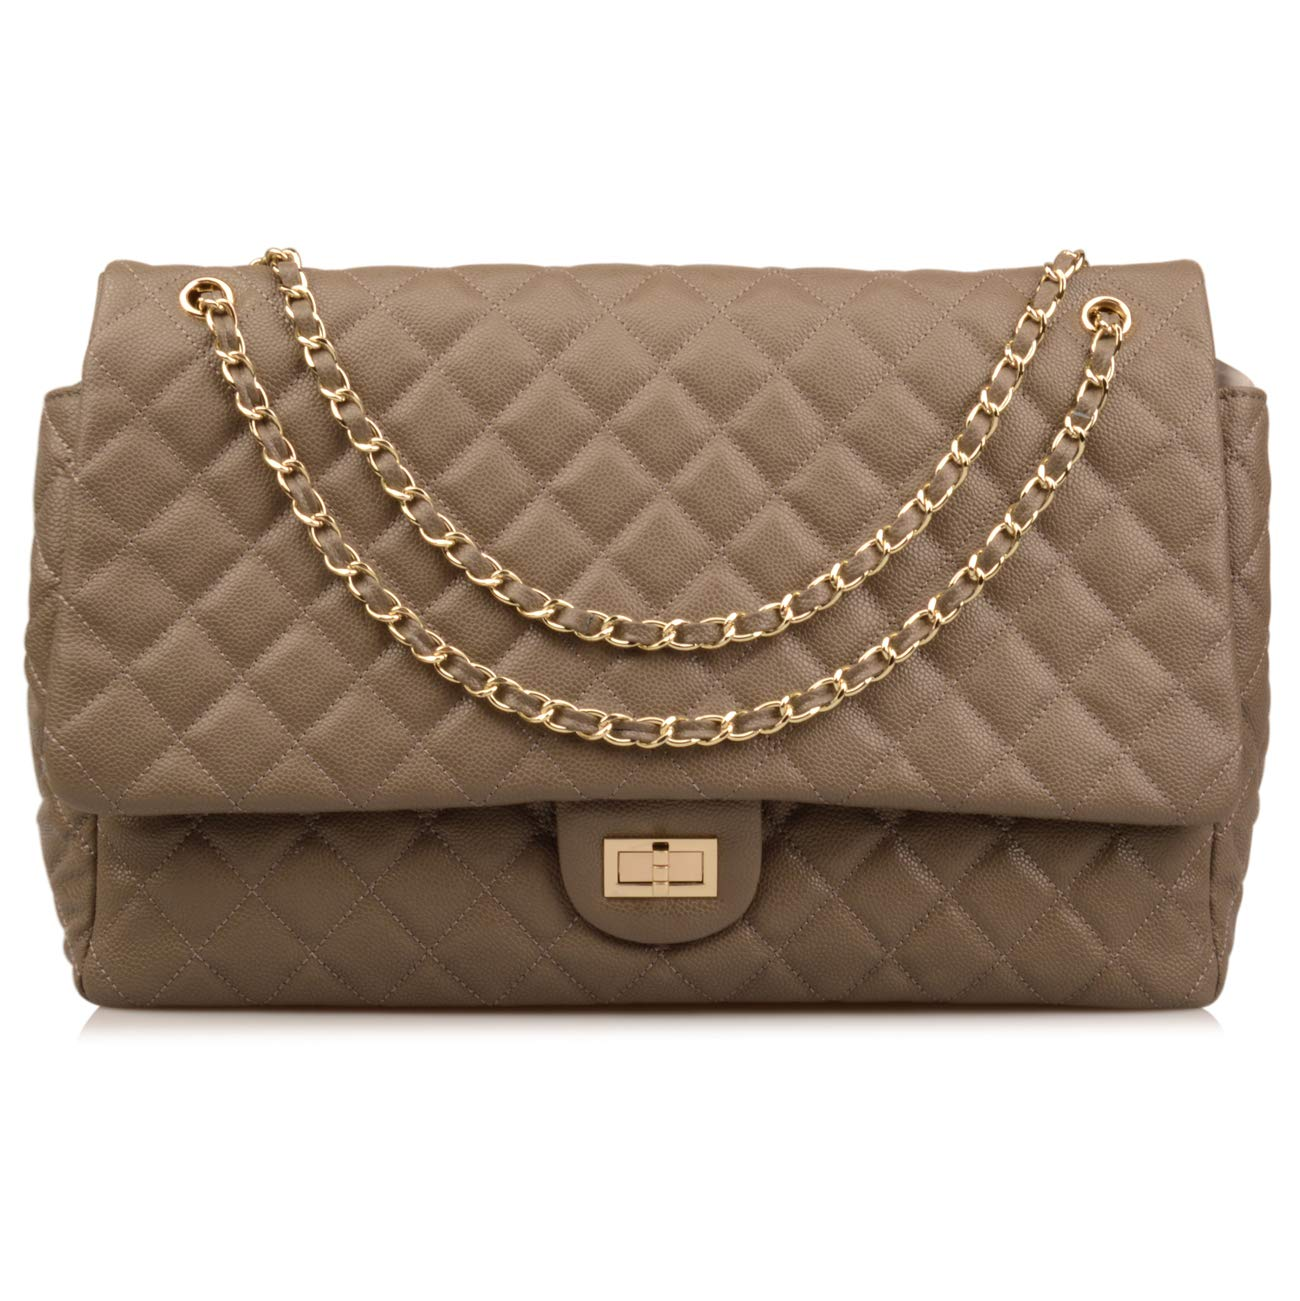 Ainifeel Women's Genuine Leather Oversize Quilted Flap Handbag Large Travelling Tote Bag Luggage Holdall (Oversize, Grey (gold hardware))